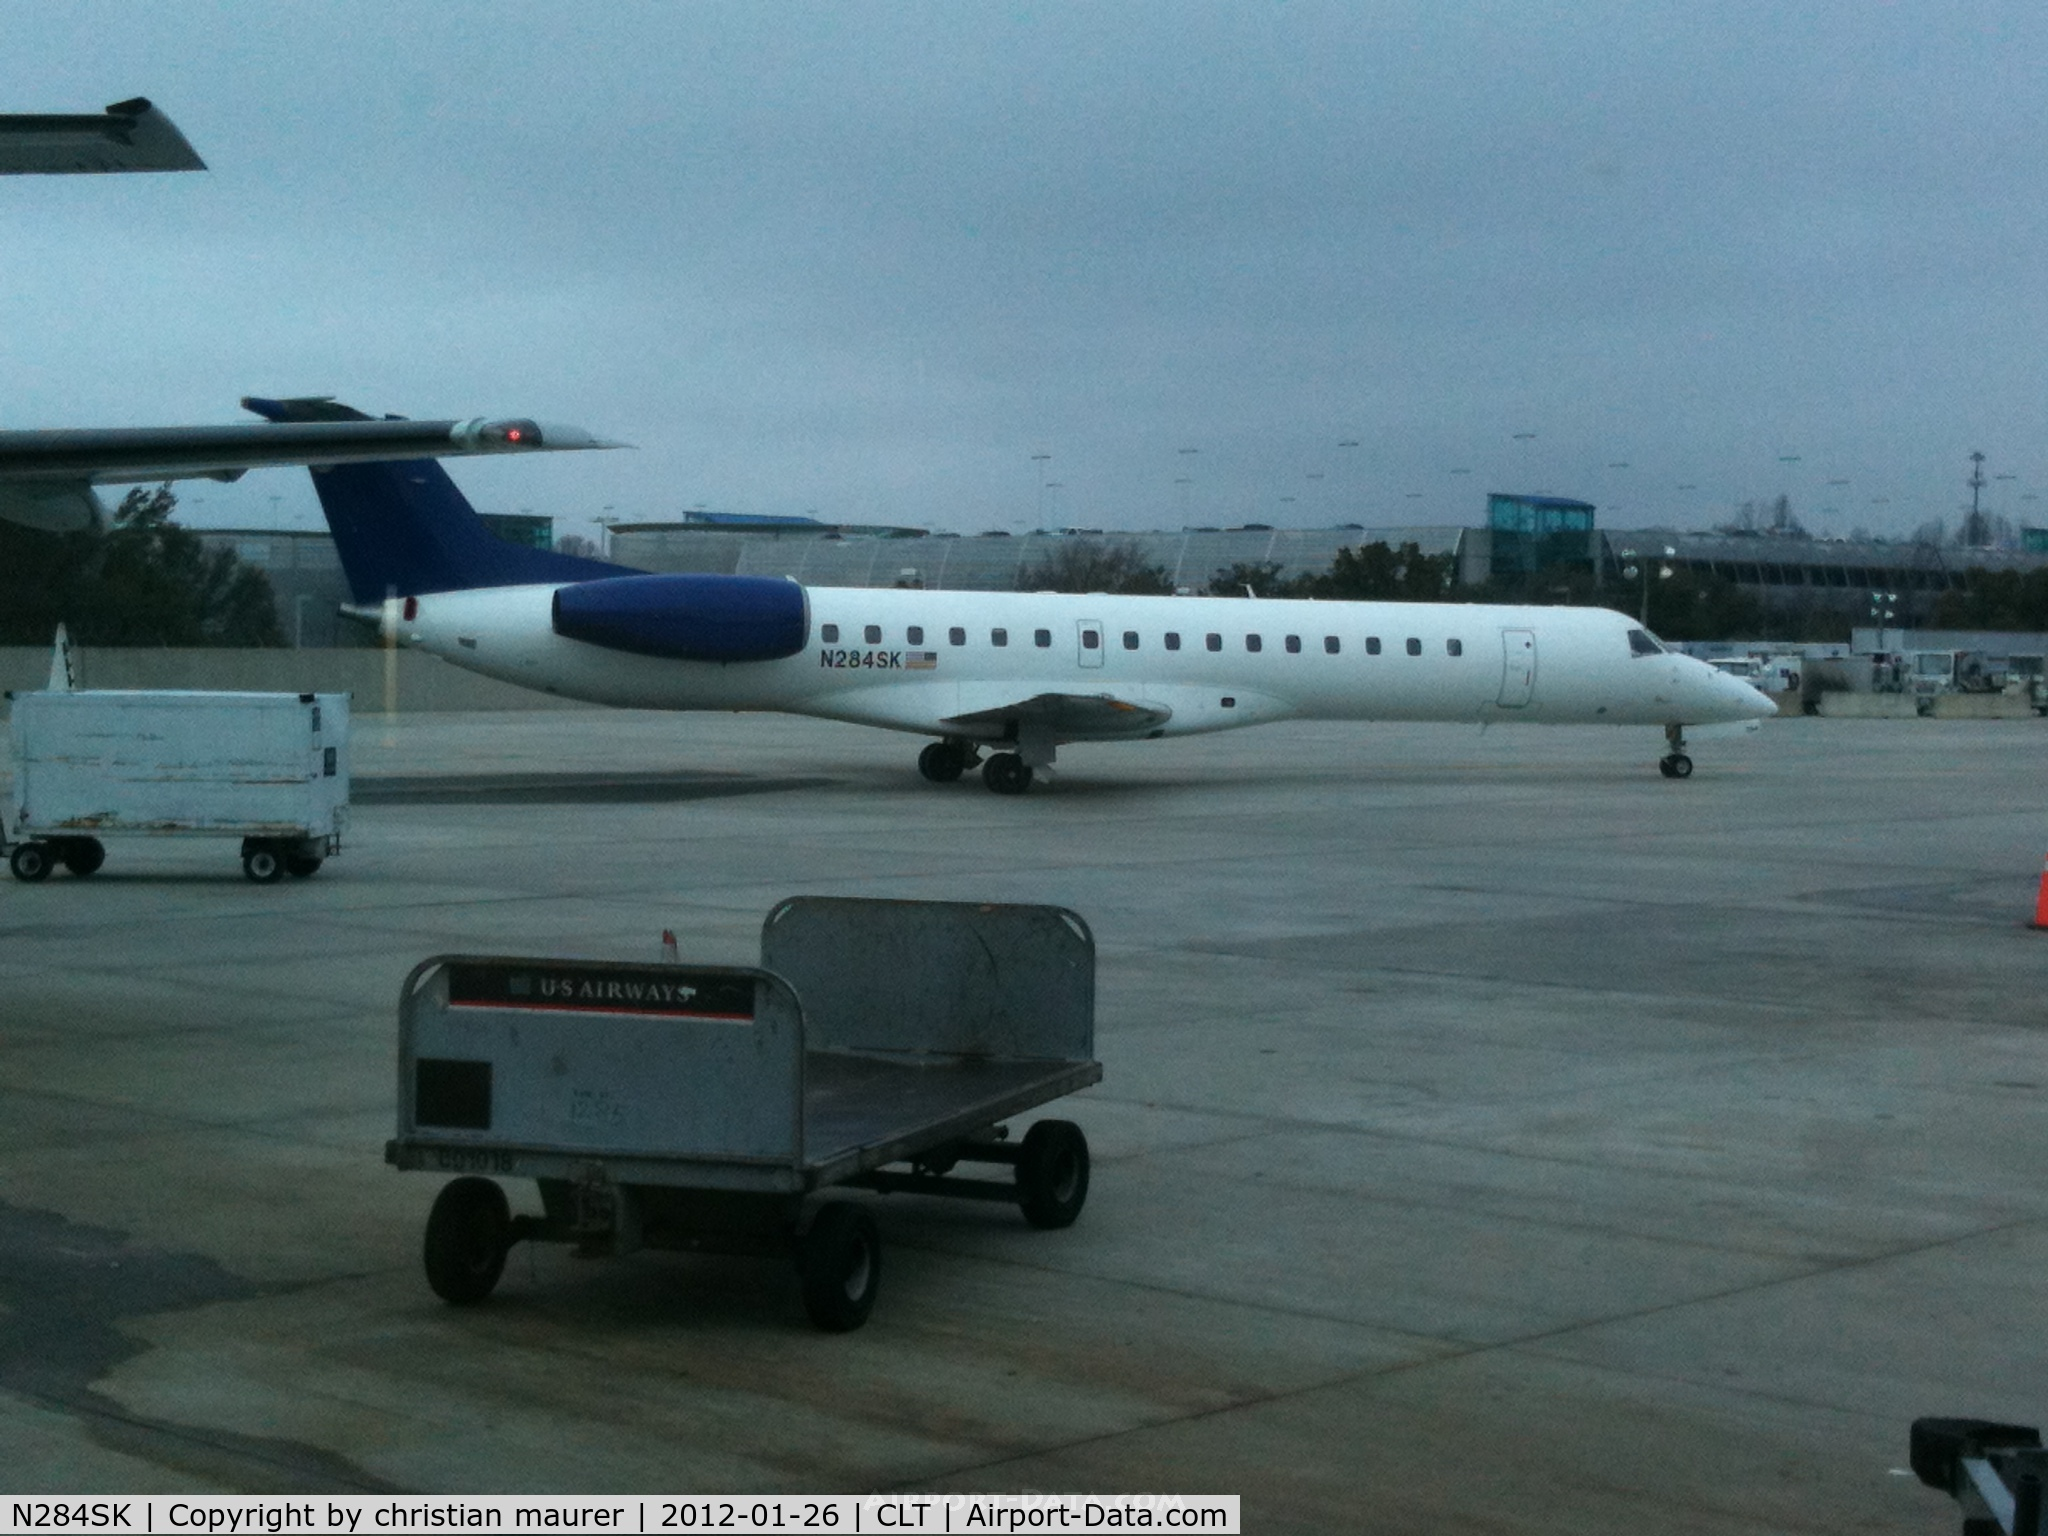 N284SK, 2001 Embraer EMB-145LR C/N 145427, Chautauqua ERJ-145LR